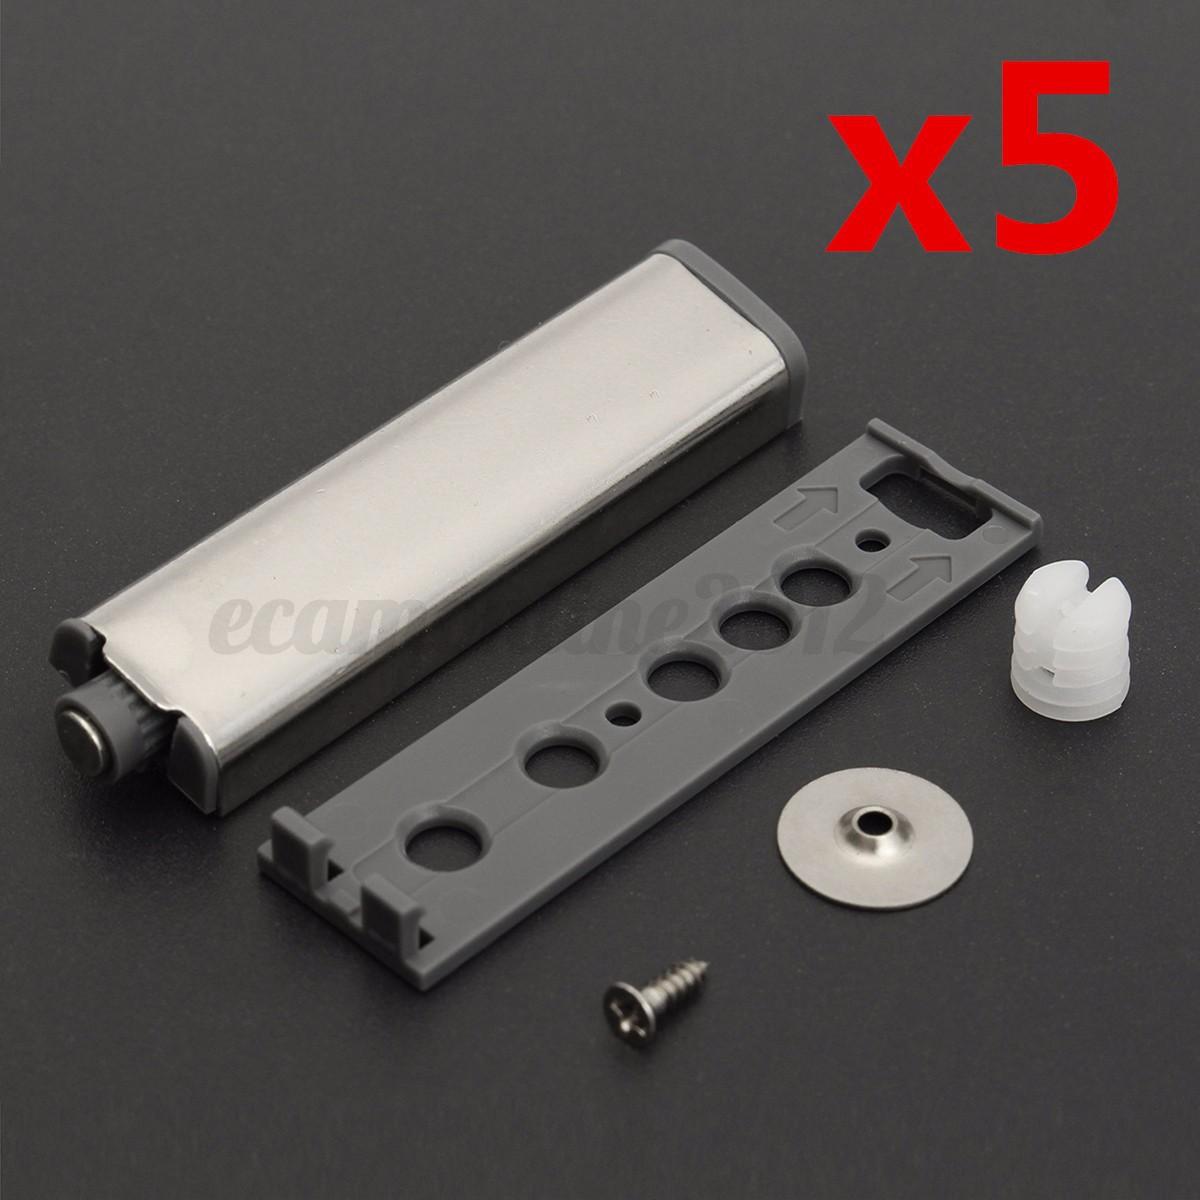 5pcs cabinet door drawer push to open system damper buffer catch latch magnetic ebay. Black Bedroom Furniture Sets. Home Design Ideas